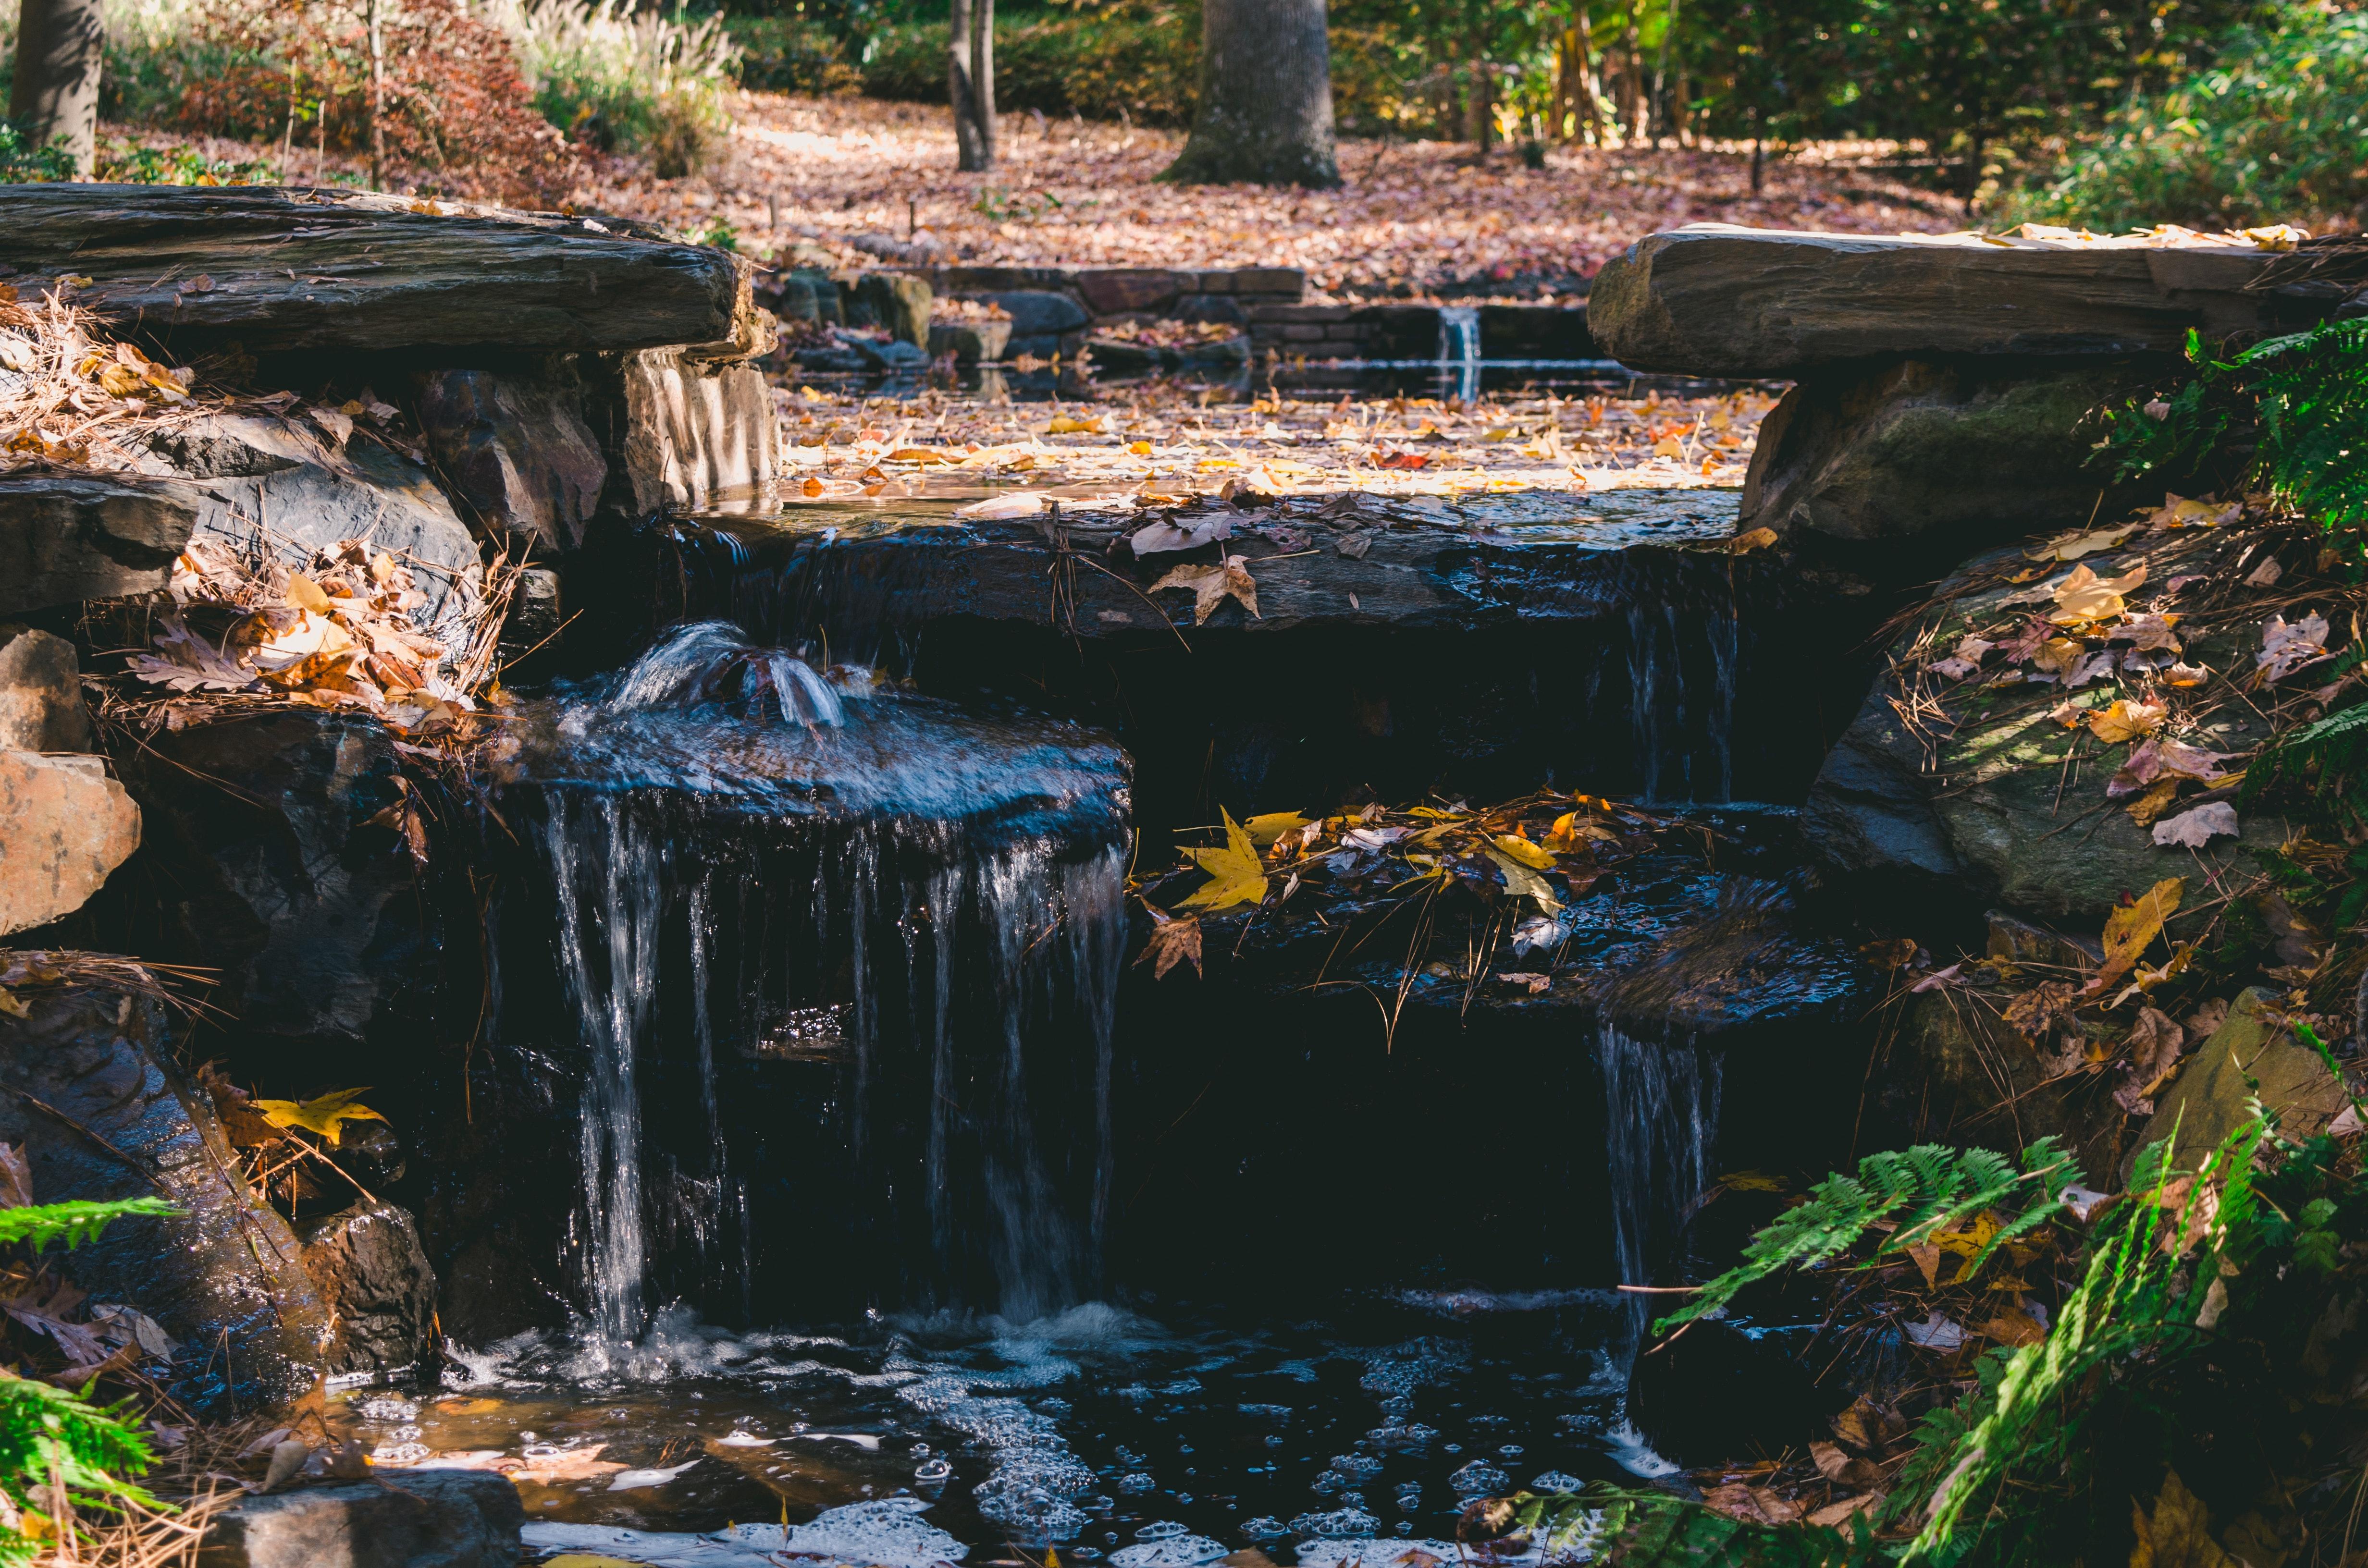 Waterfalls, Stream, Scenic, Rocks, Park, HQ Photo